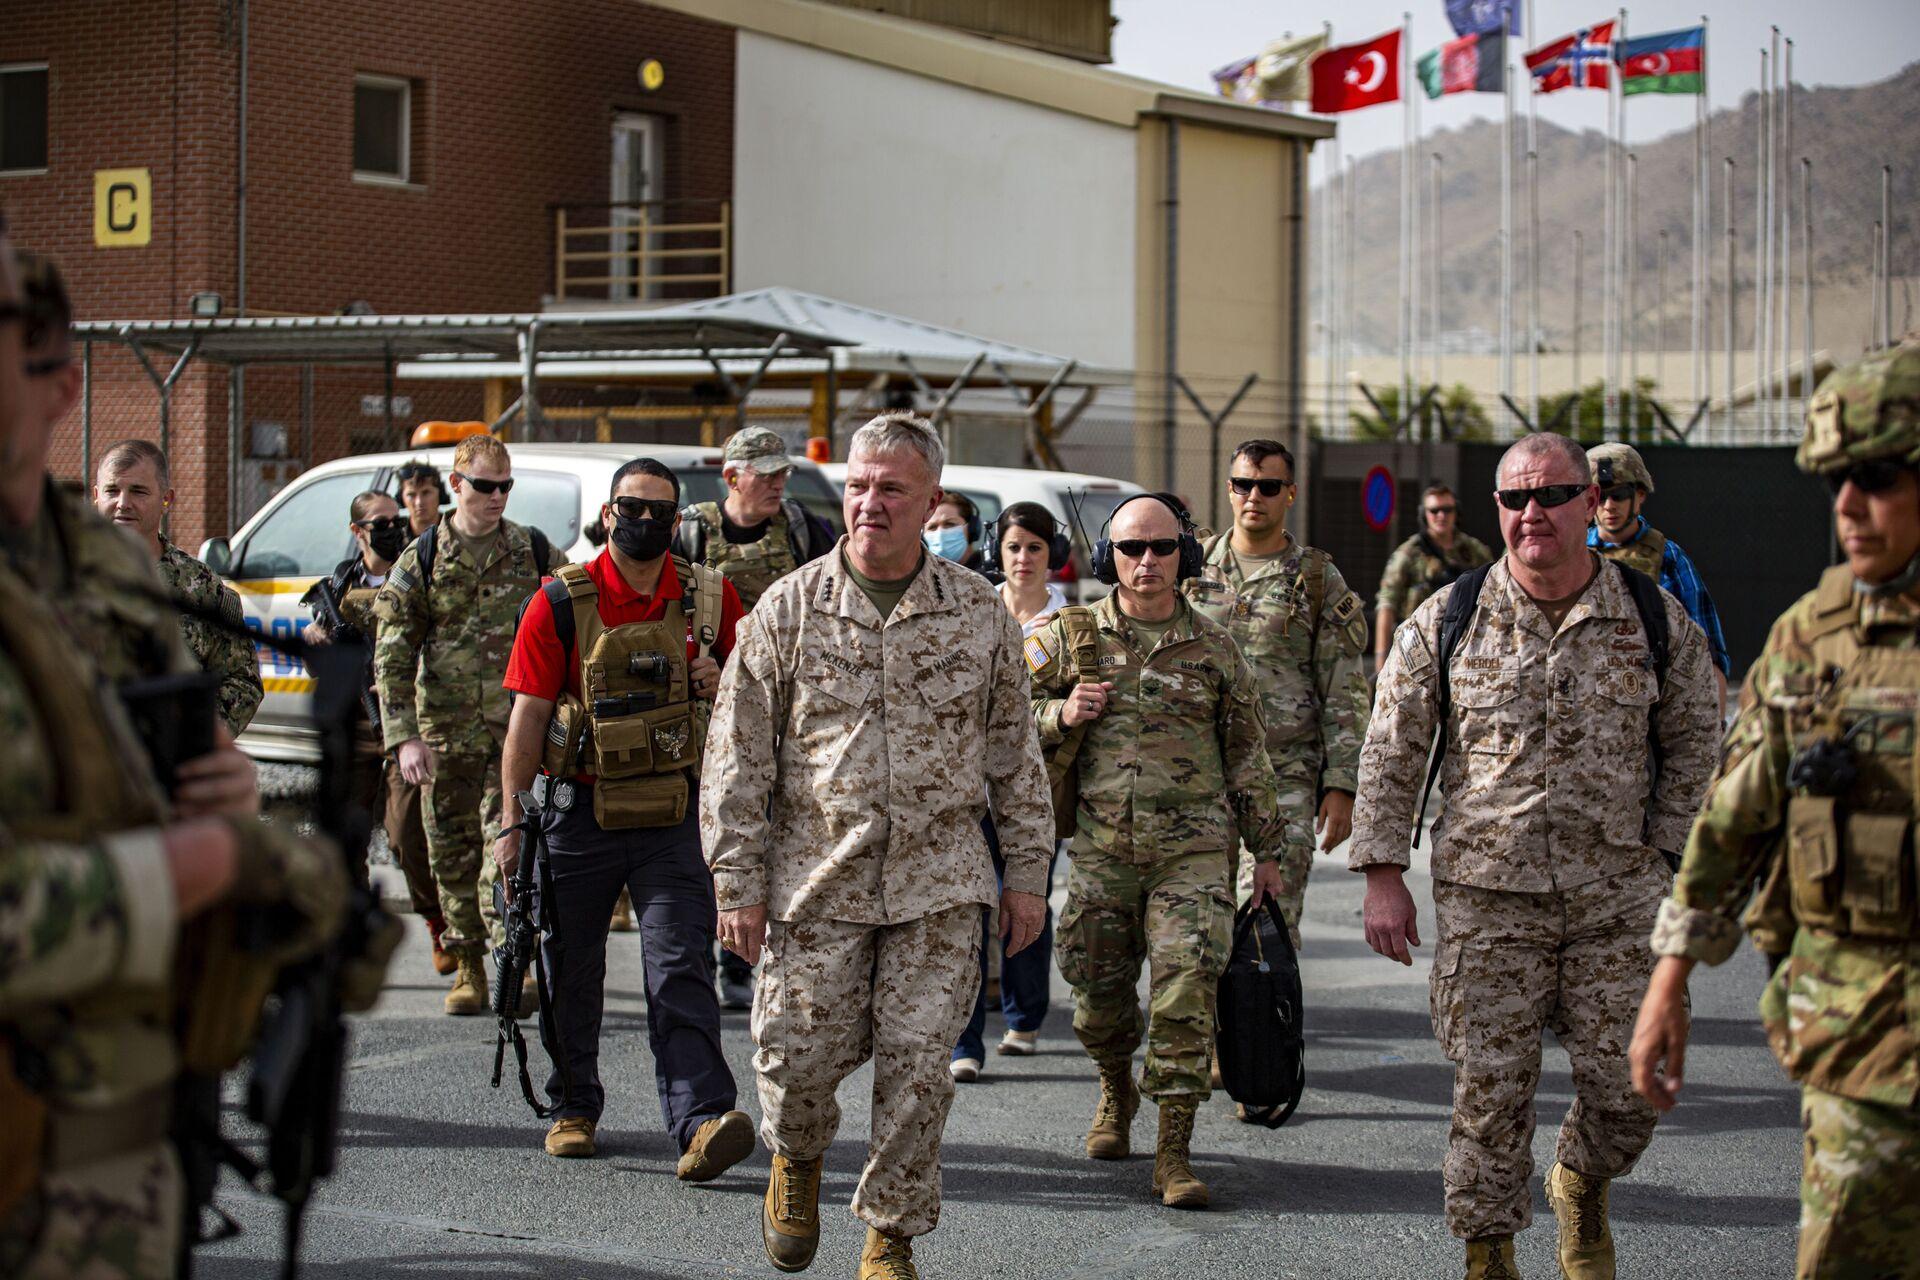 Commanding General U. Central Command Kenneth F. McKenzie, center, tours an evacuation control center at Hamid Karzai International Airport, Afghanistan, Tuesday, August 17, 2021 - Sputnik International, 1920, 07.09.2021